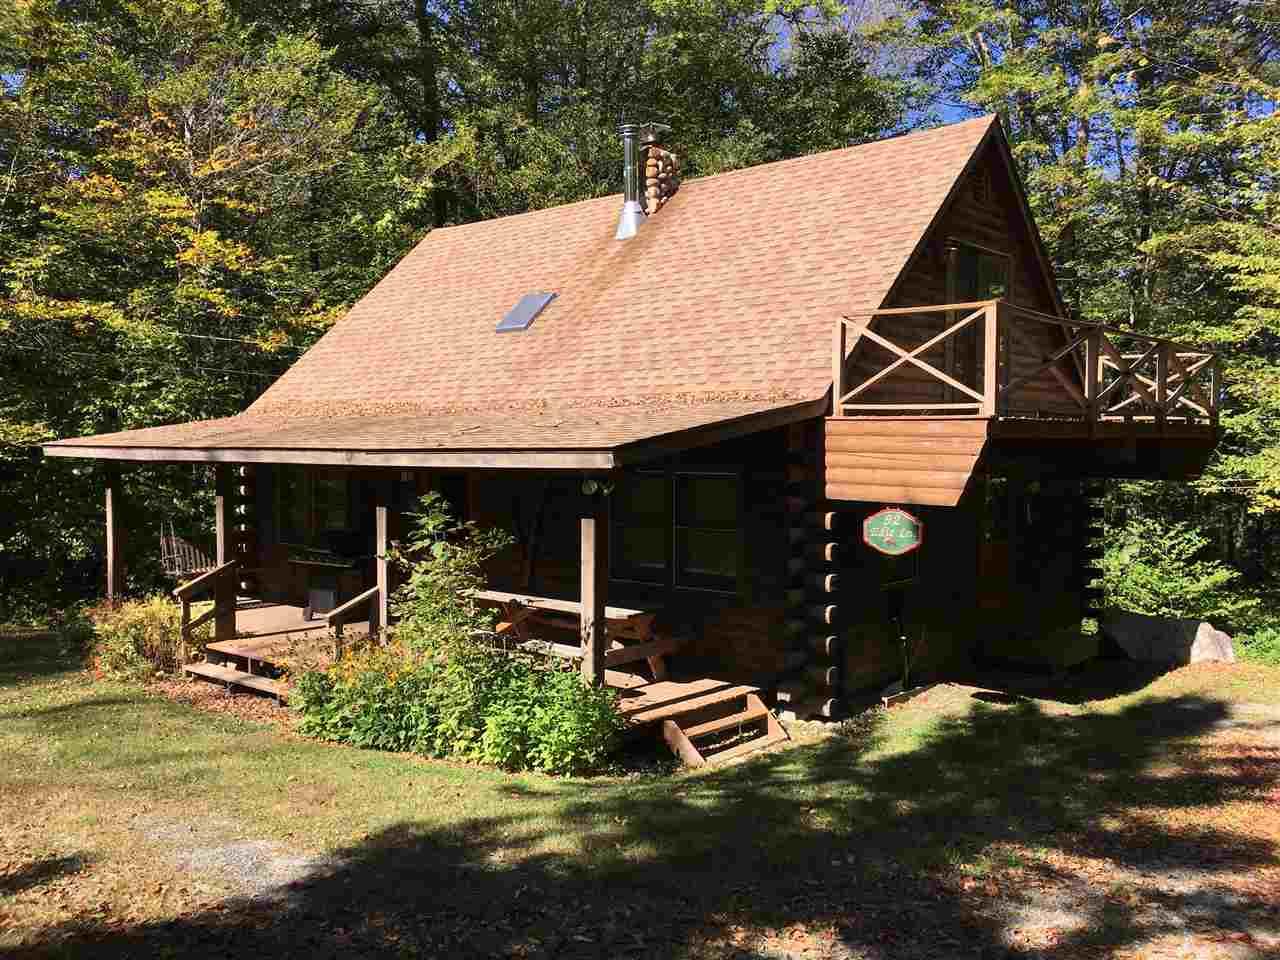 Cozy log cabin located close to Stratton Mountain...